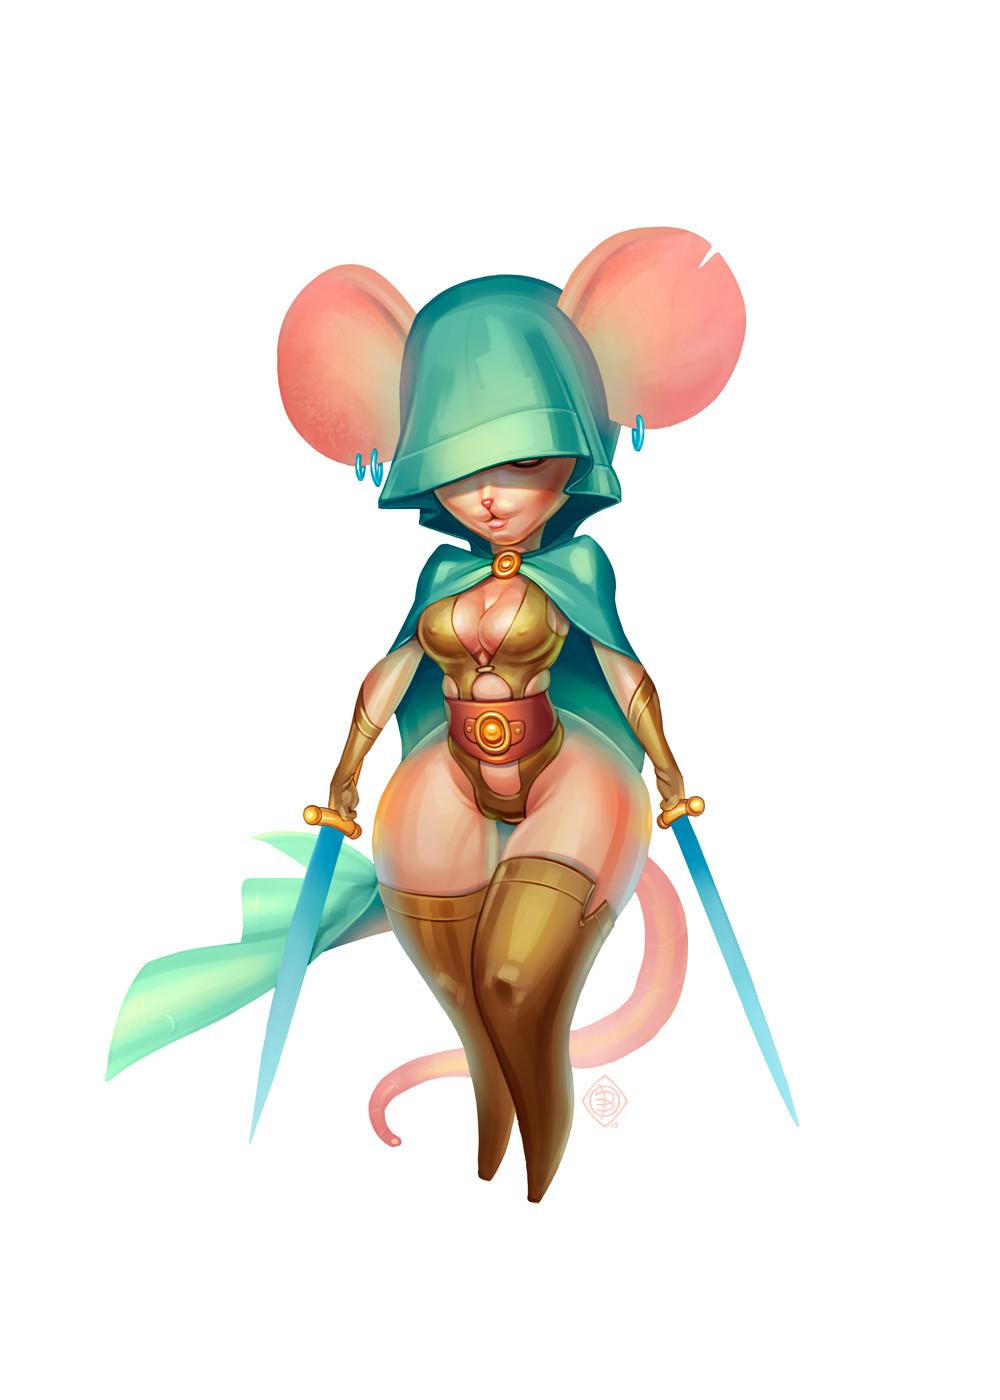 Andrey kamenov mousewarrior she 05